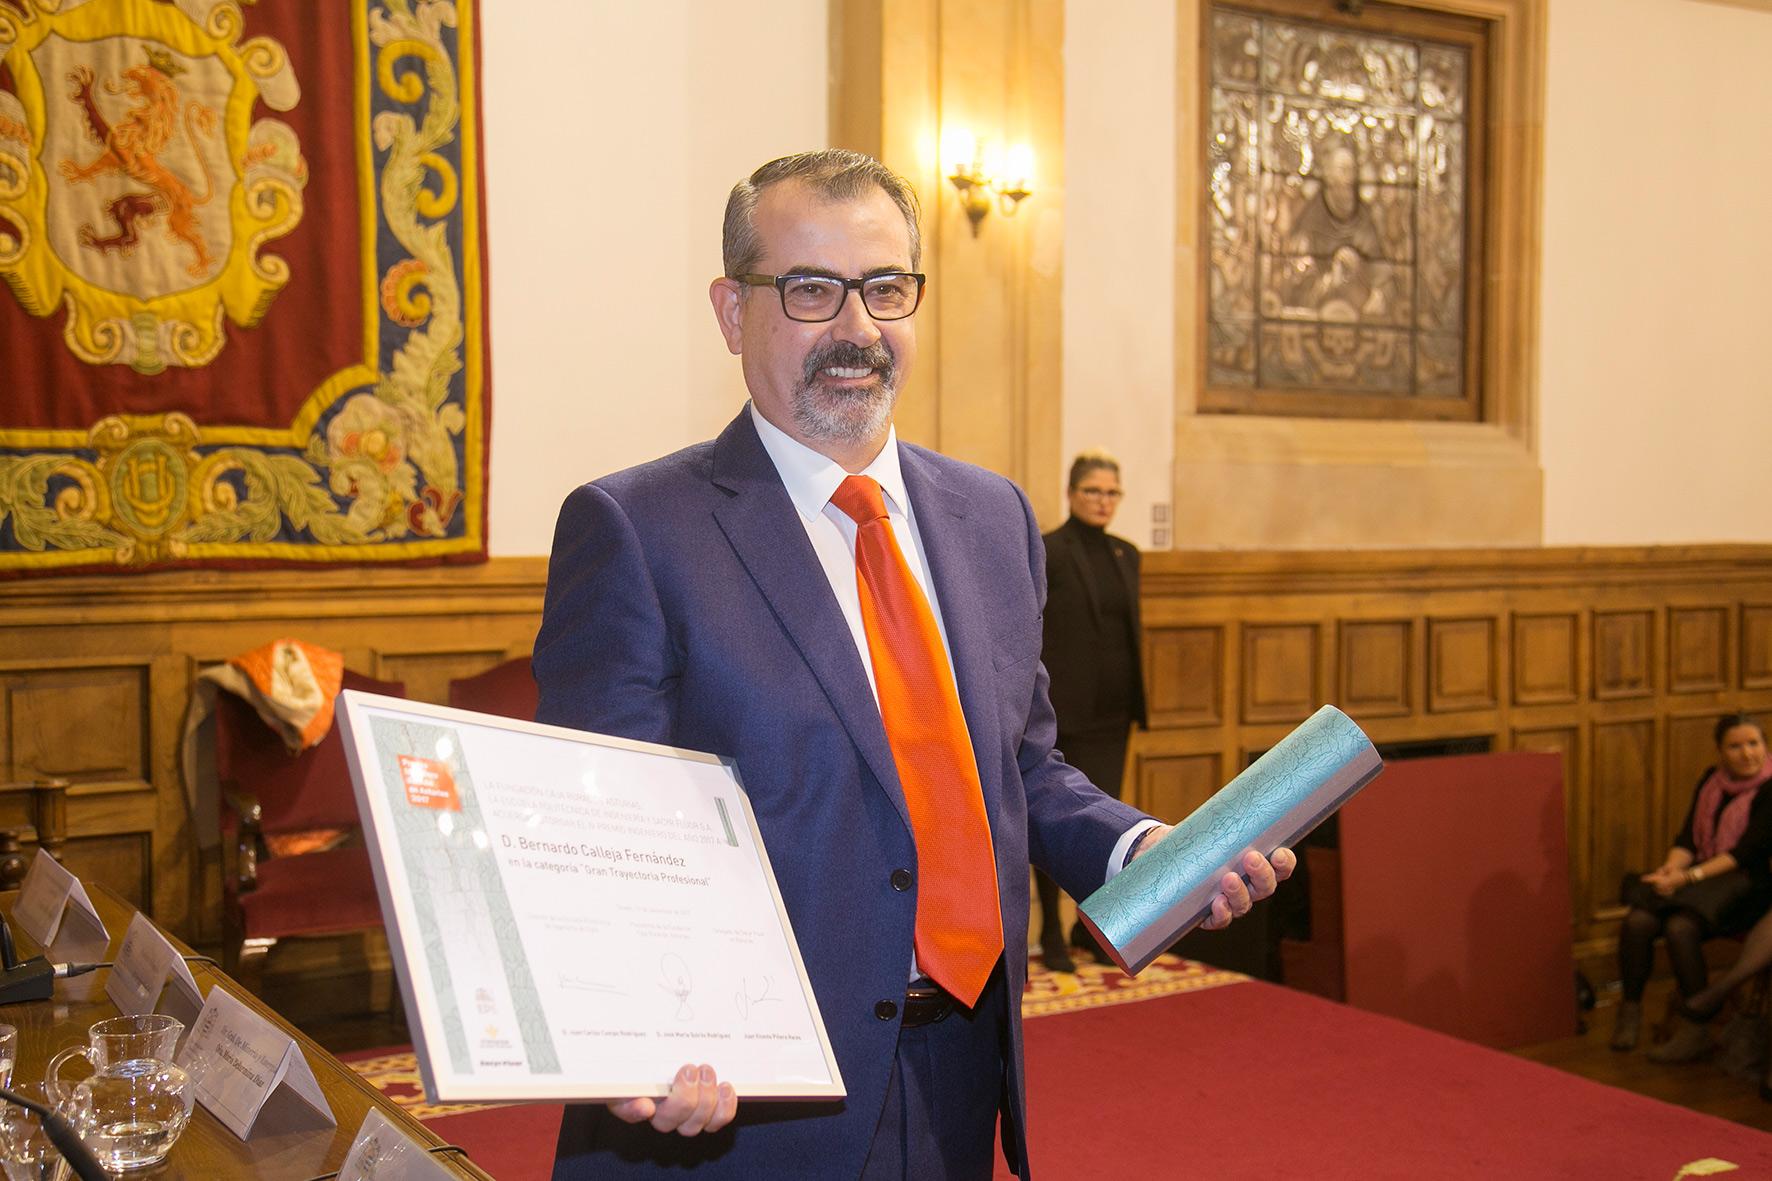 Bernardo-Calleja-Premio-Ingeniero-Año-Asturias-2017